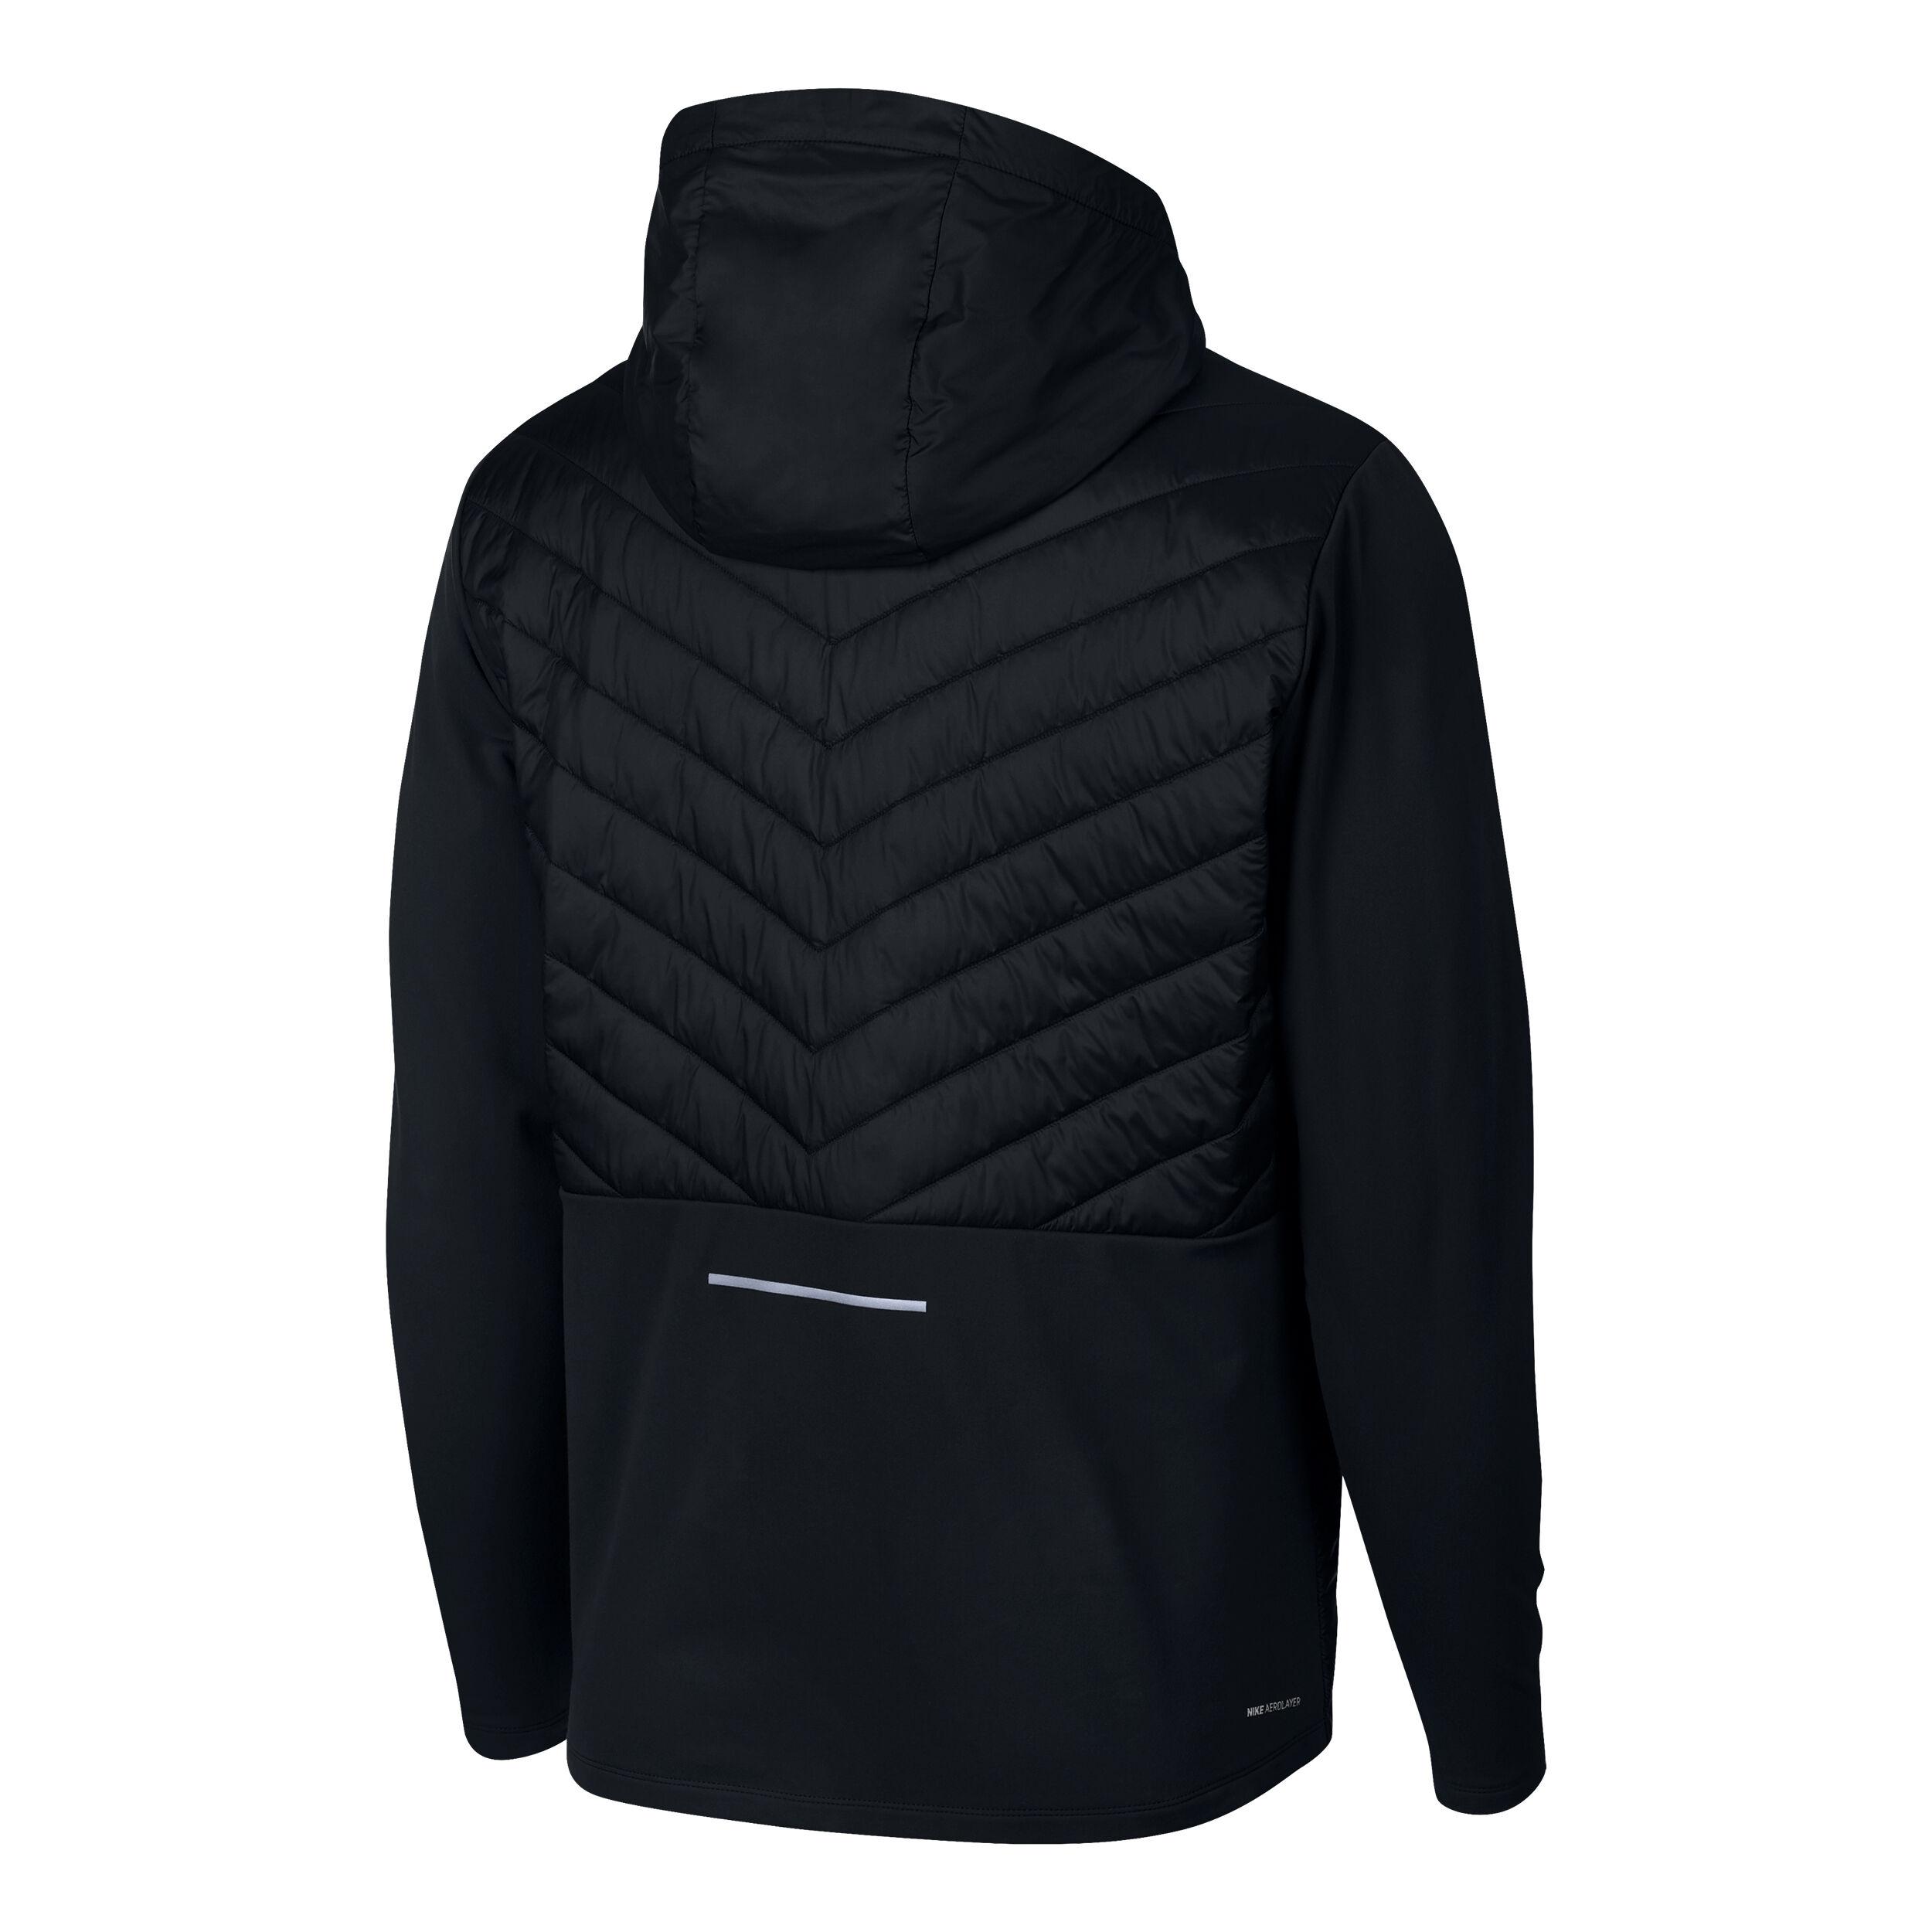 Nike AeroLayer Laufjacke Herren Schwarz, Silber